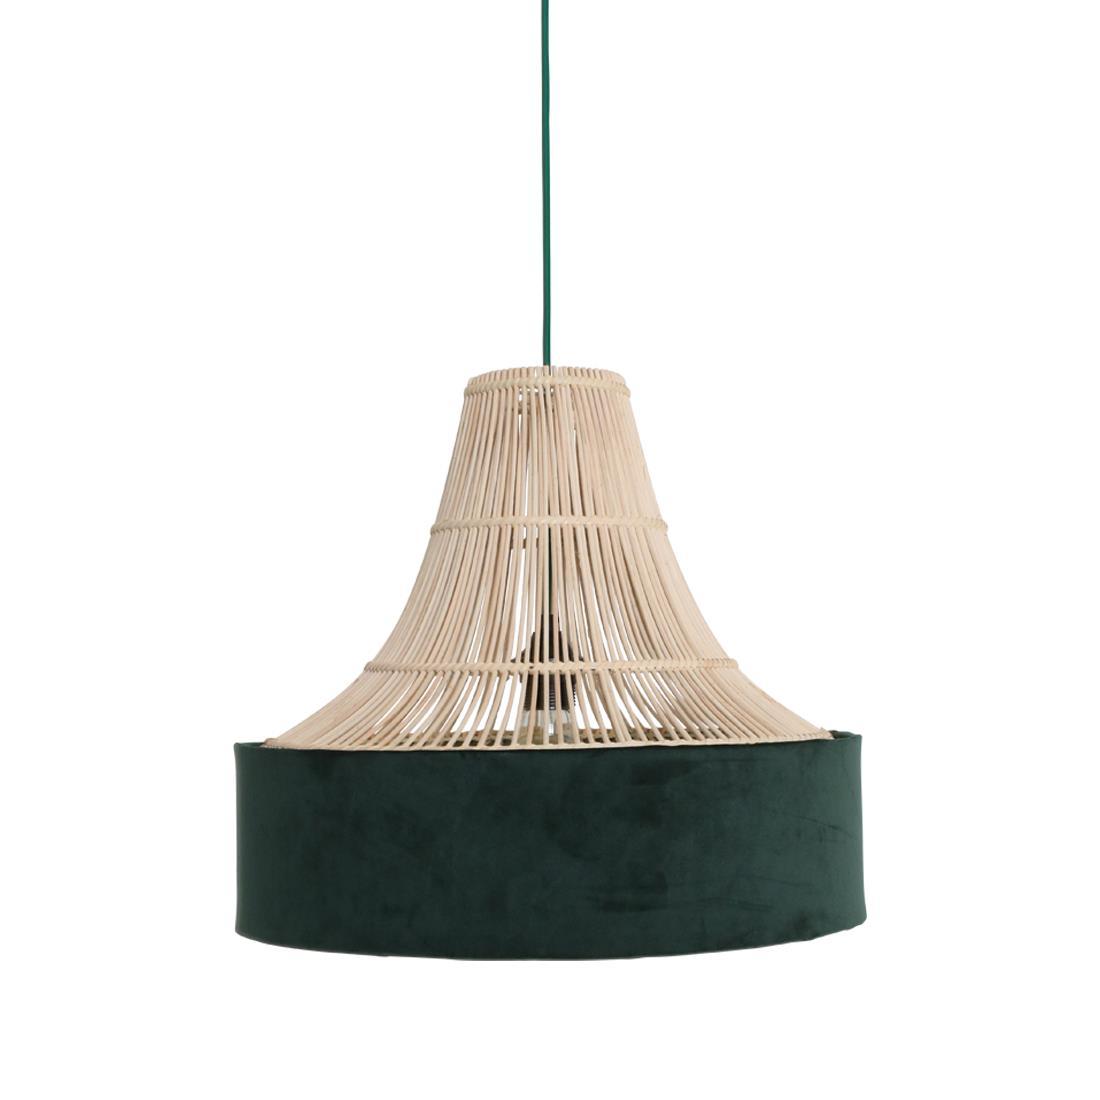 FonQ-Raw Materials Suave Hanglamp Groen-aanbieding